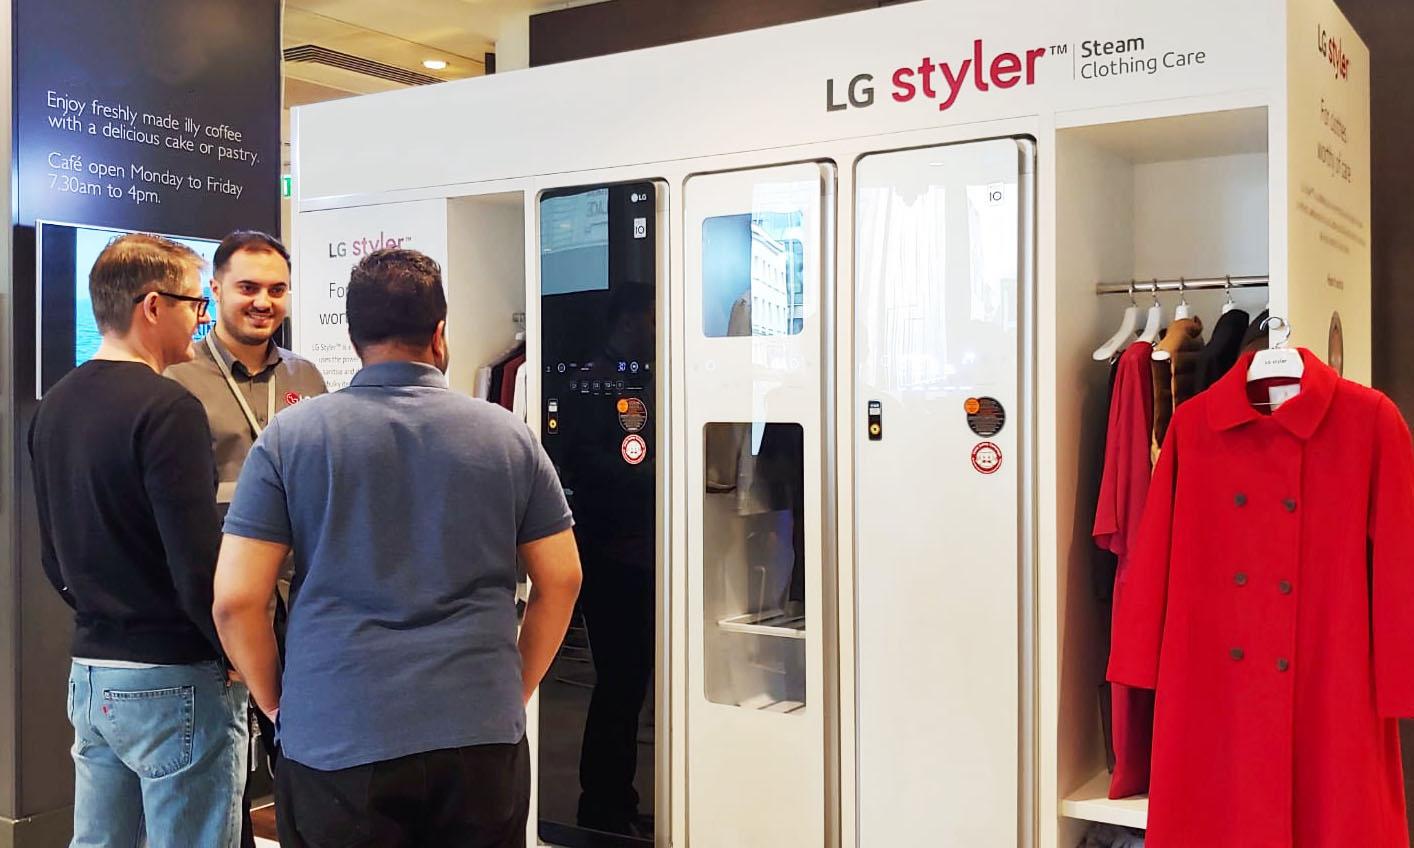 LG 스타일러 英 프리미엄 백화점 '존 루이스' 입점